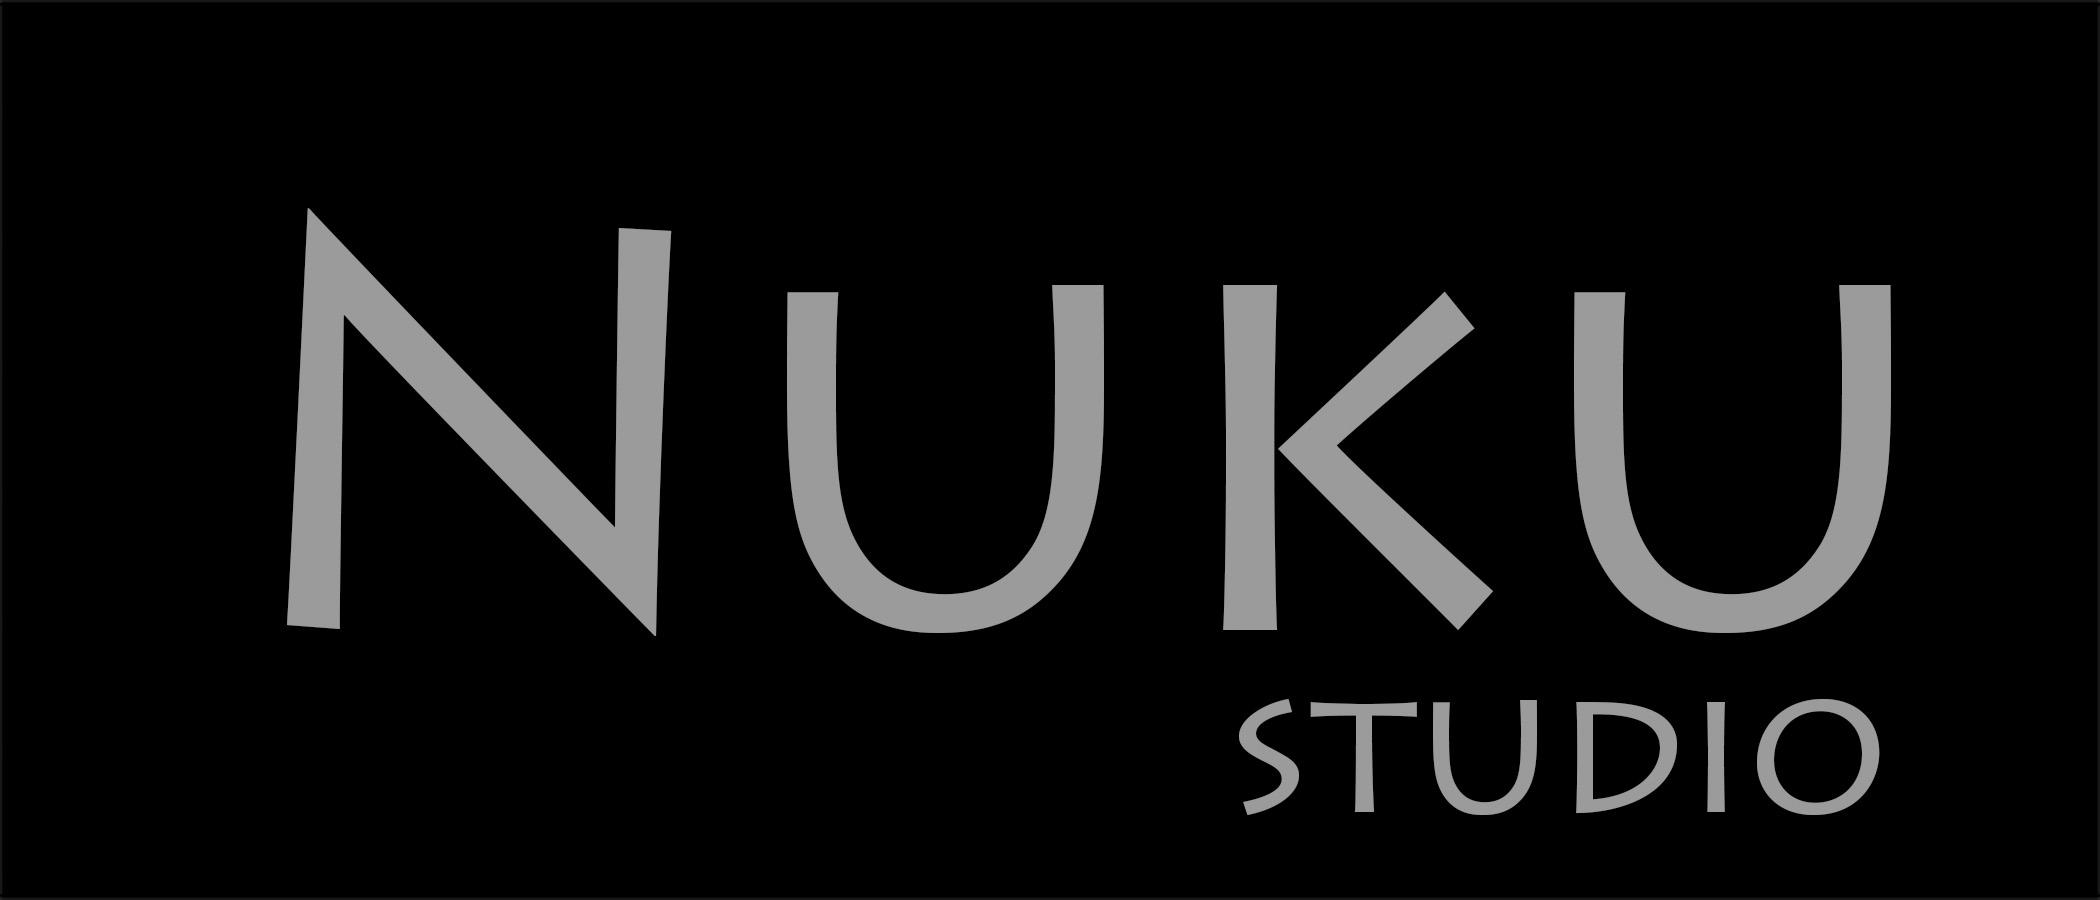 NukuStudio-logo.jpg